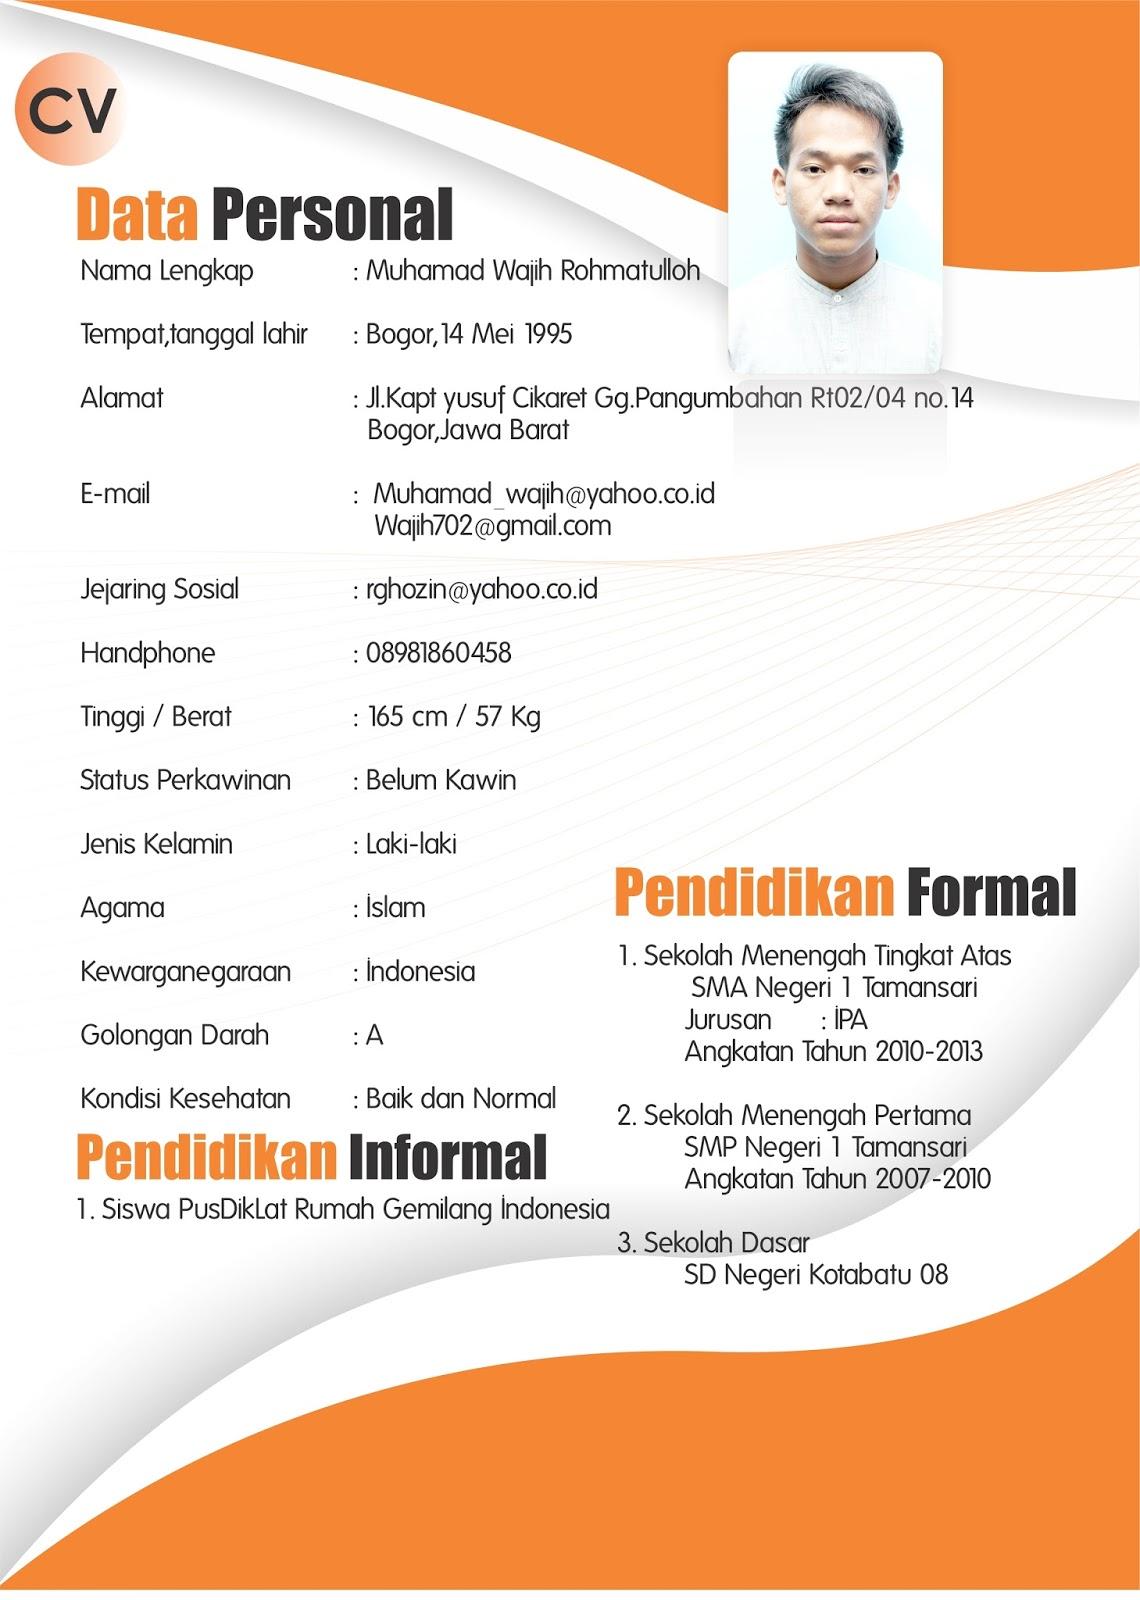 Contoh Curriculum Vitae Bahasa Inggris Word - Gambar Con